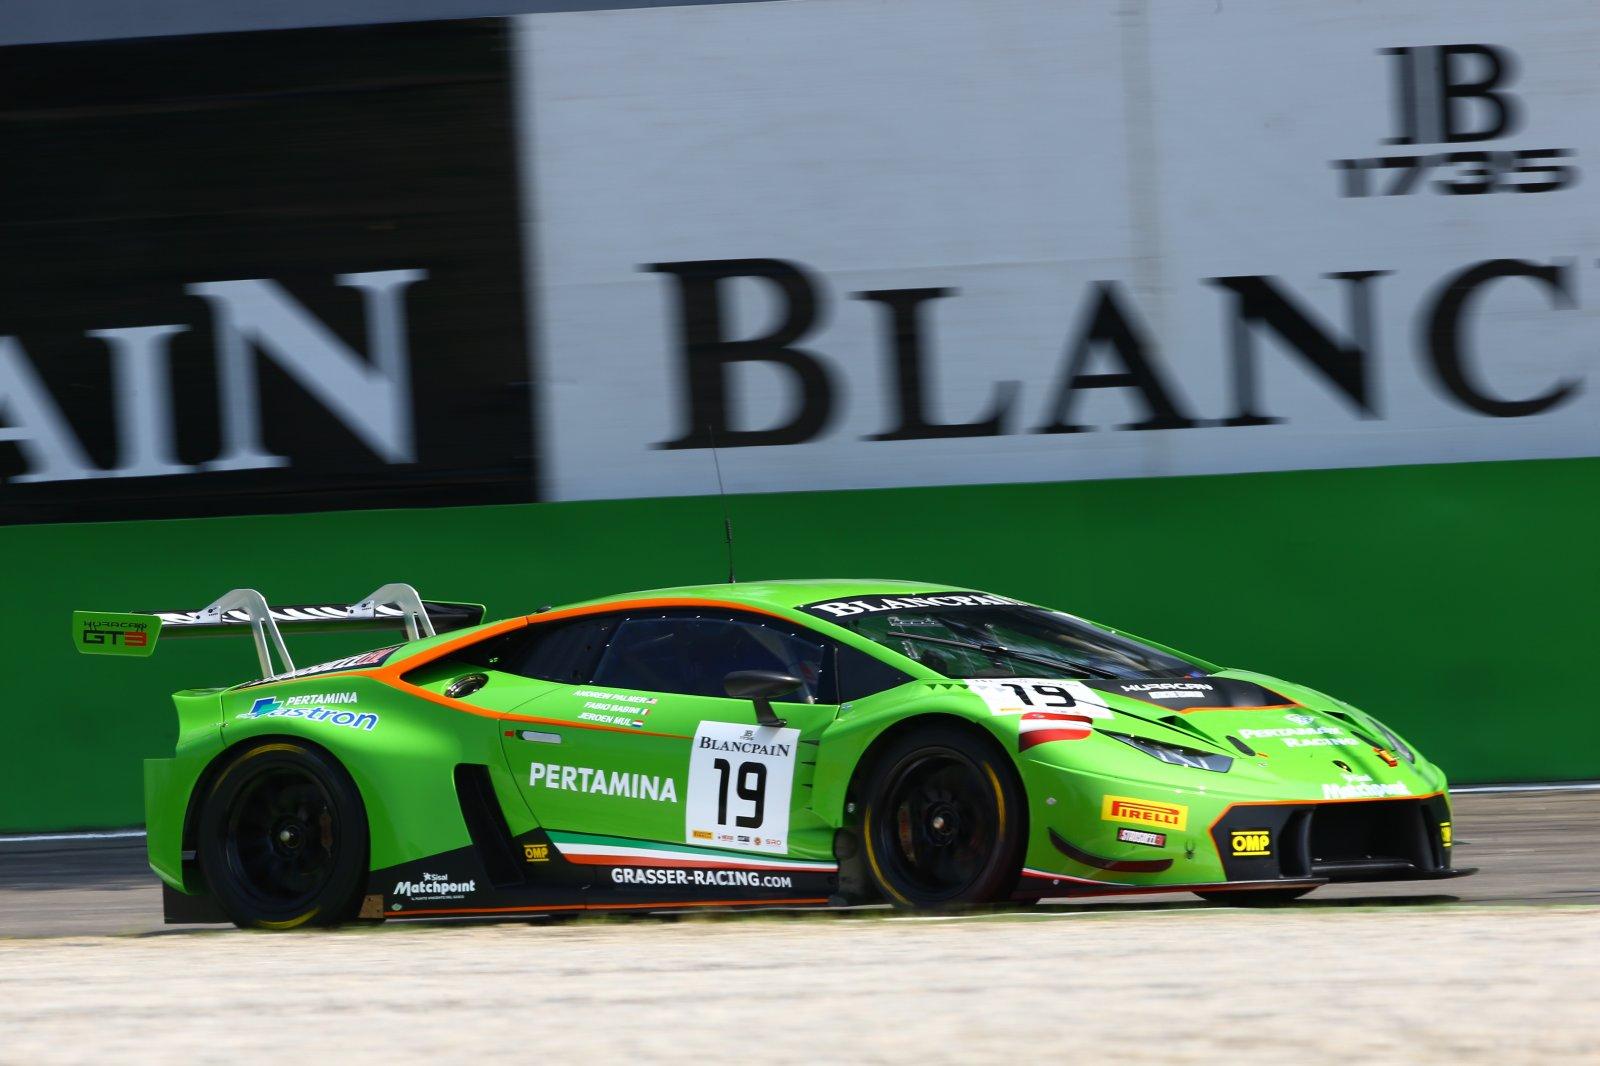 Breaking : Lamborghini Huracan takes win at maiden race